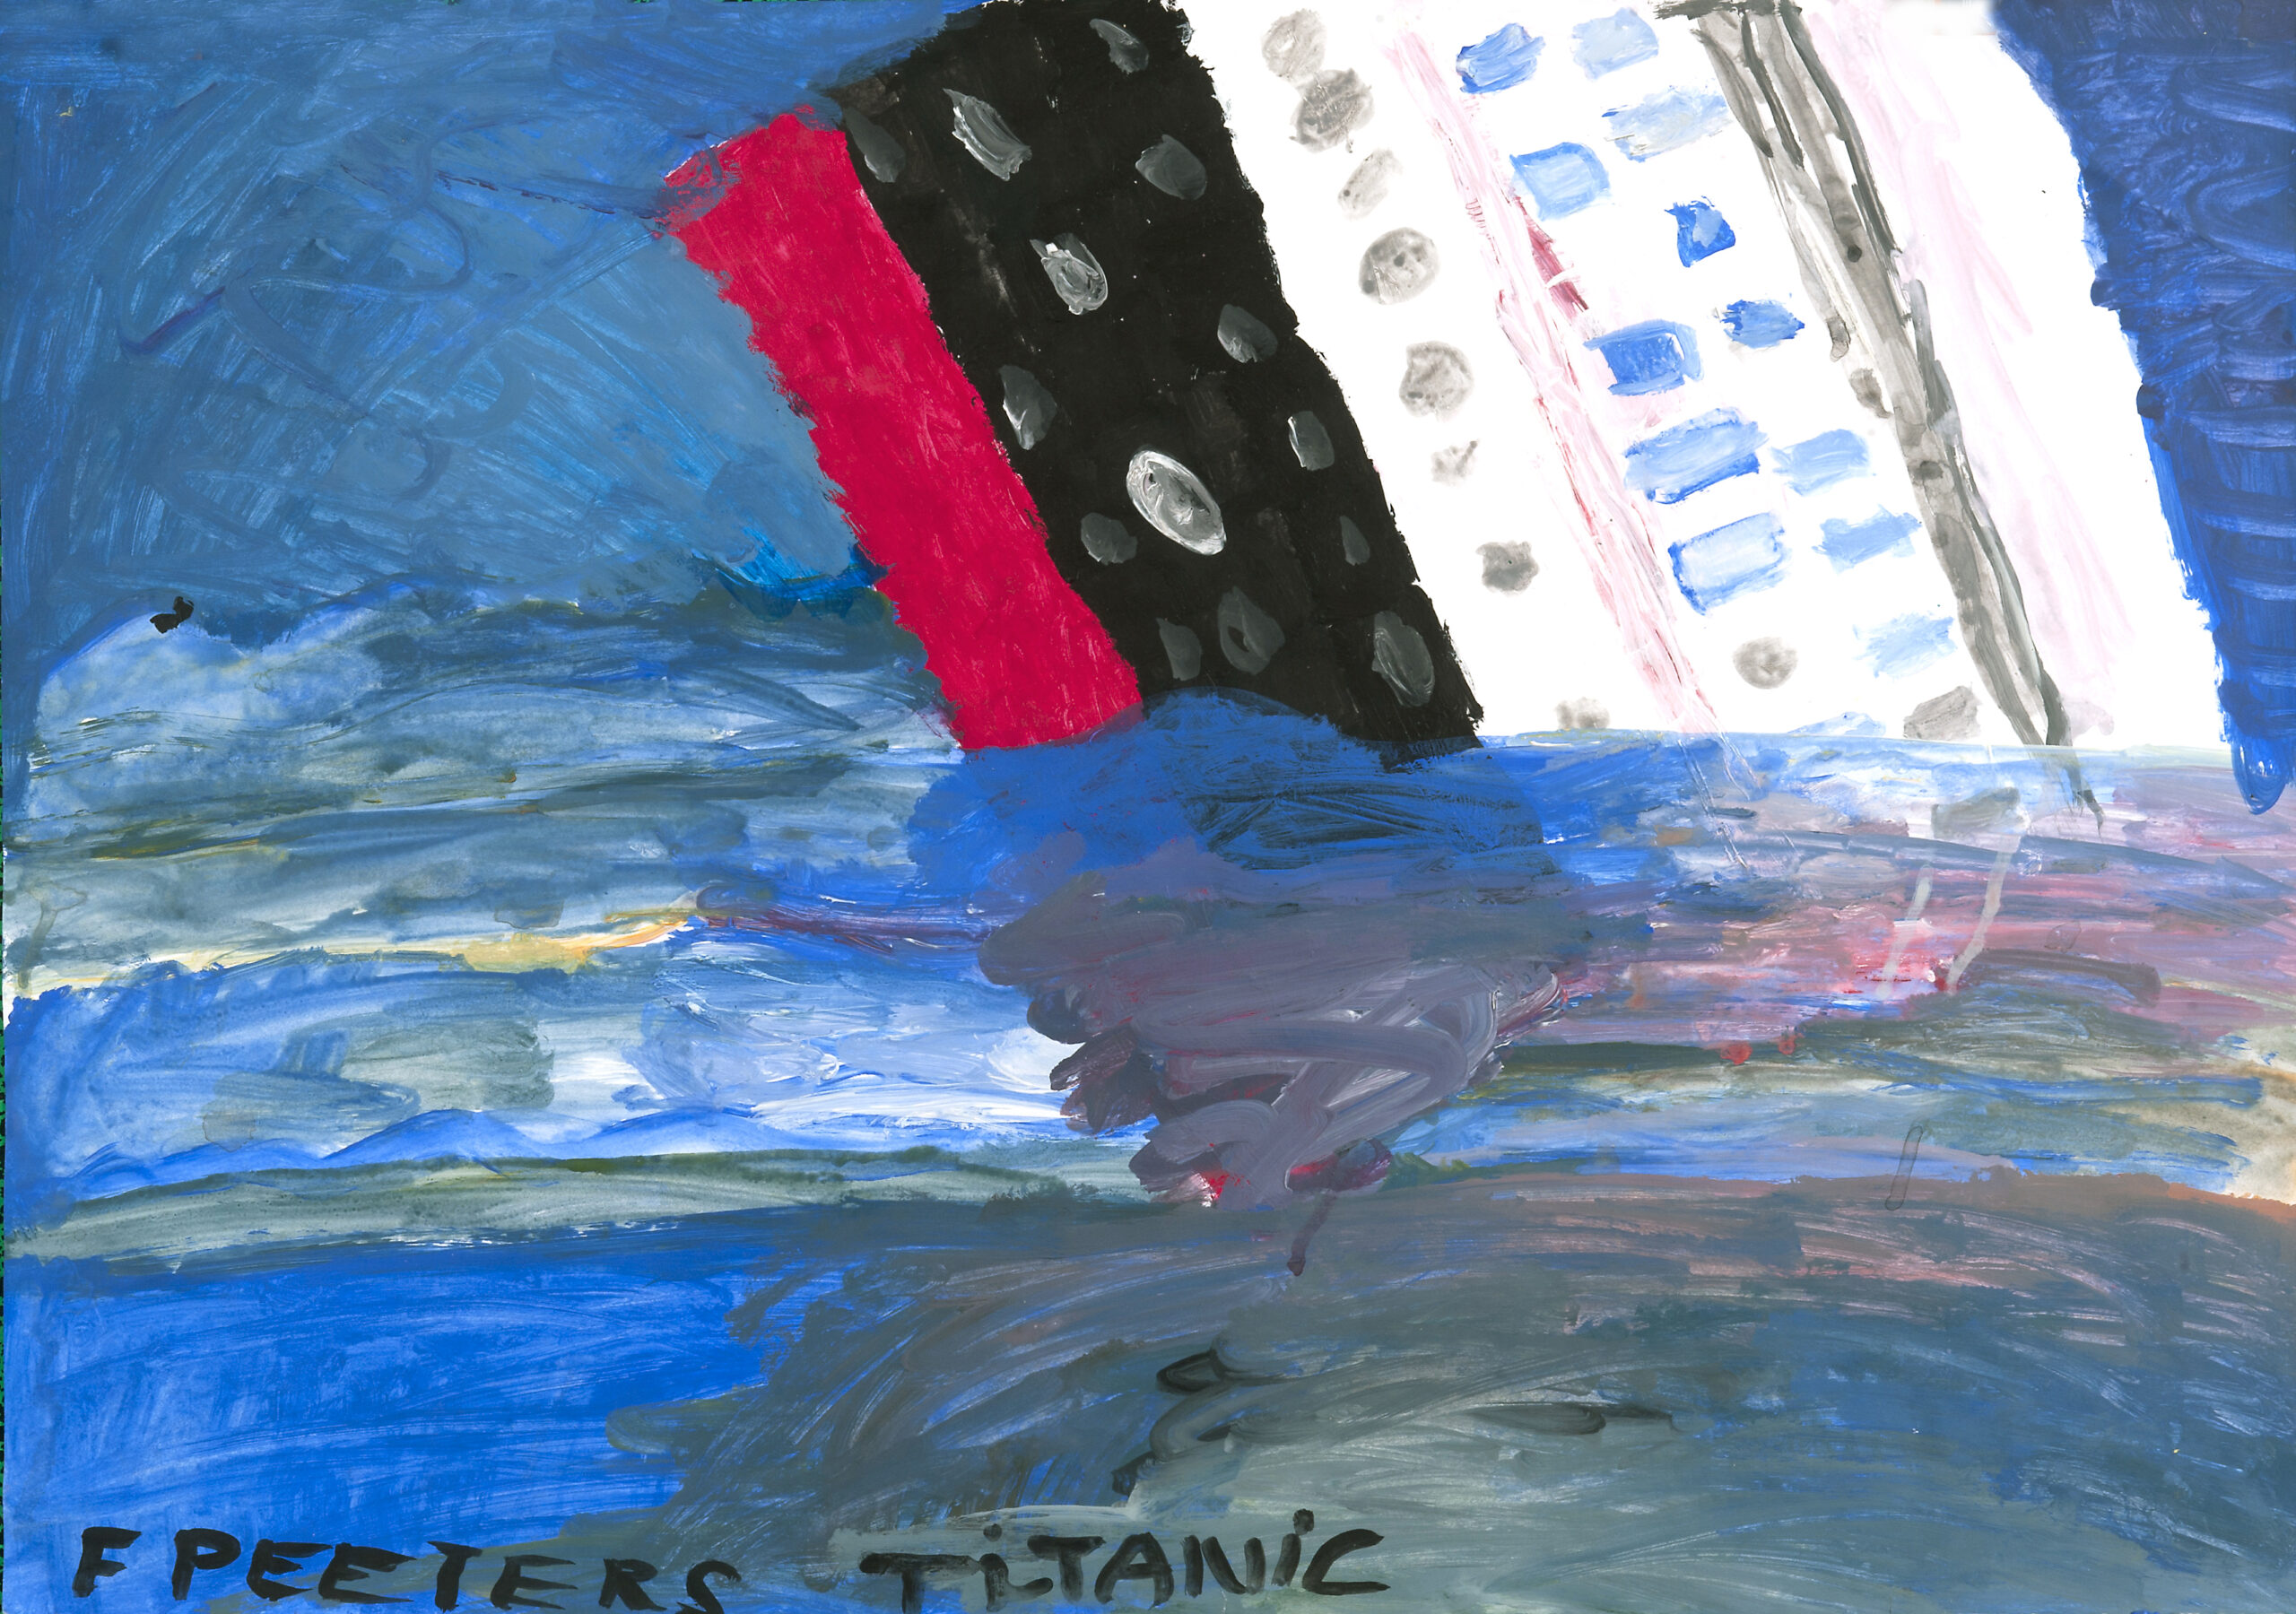 François Peeters, Série Titanic 4, 2010